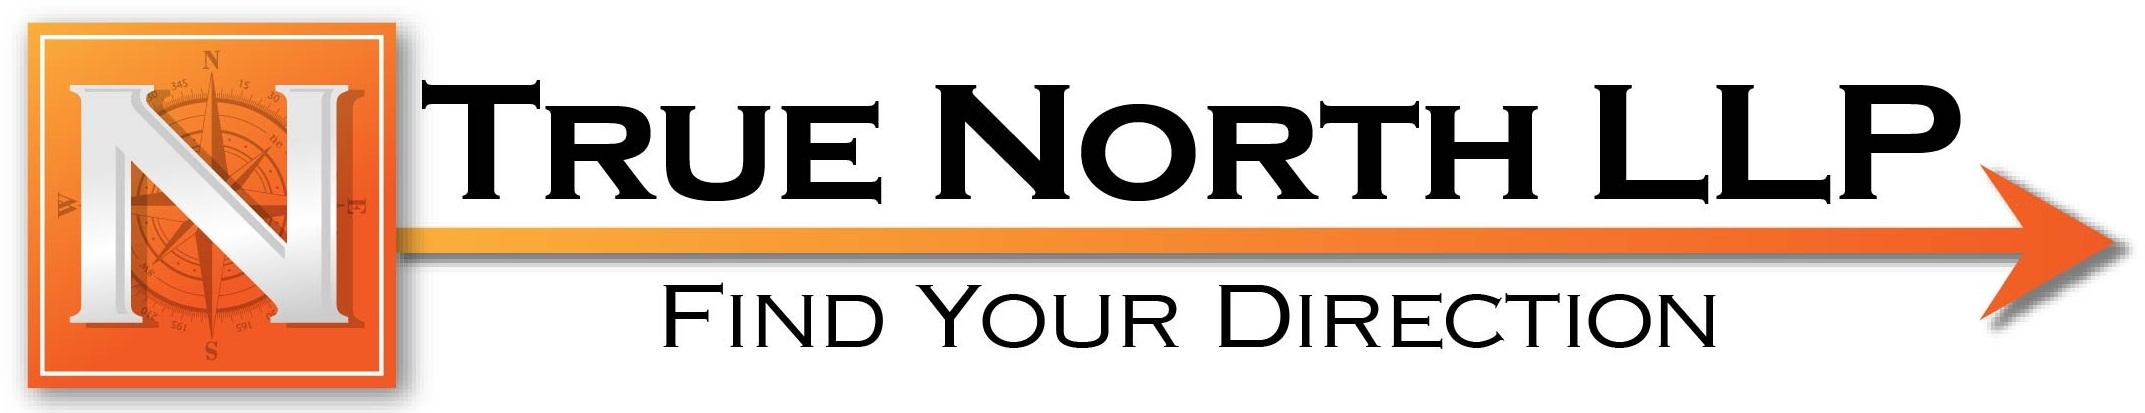 True North LLP